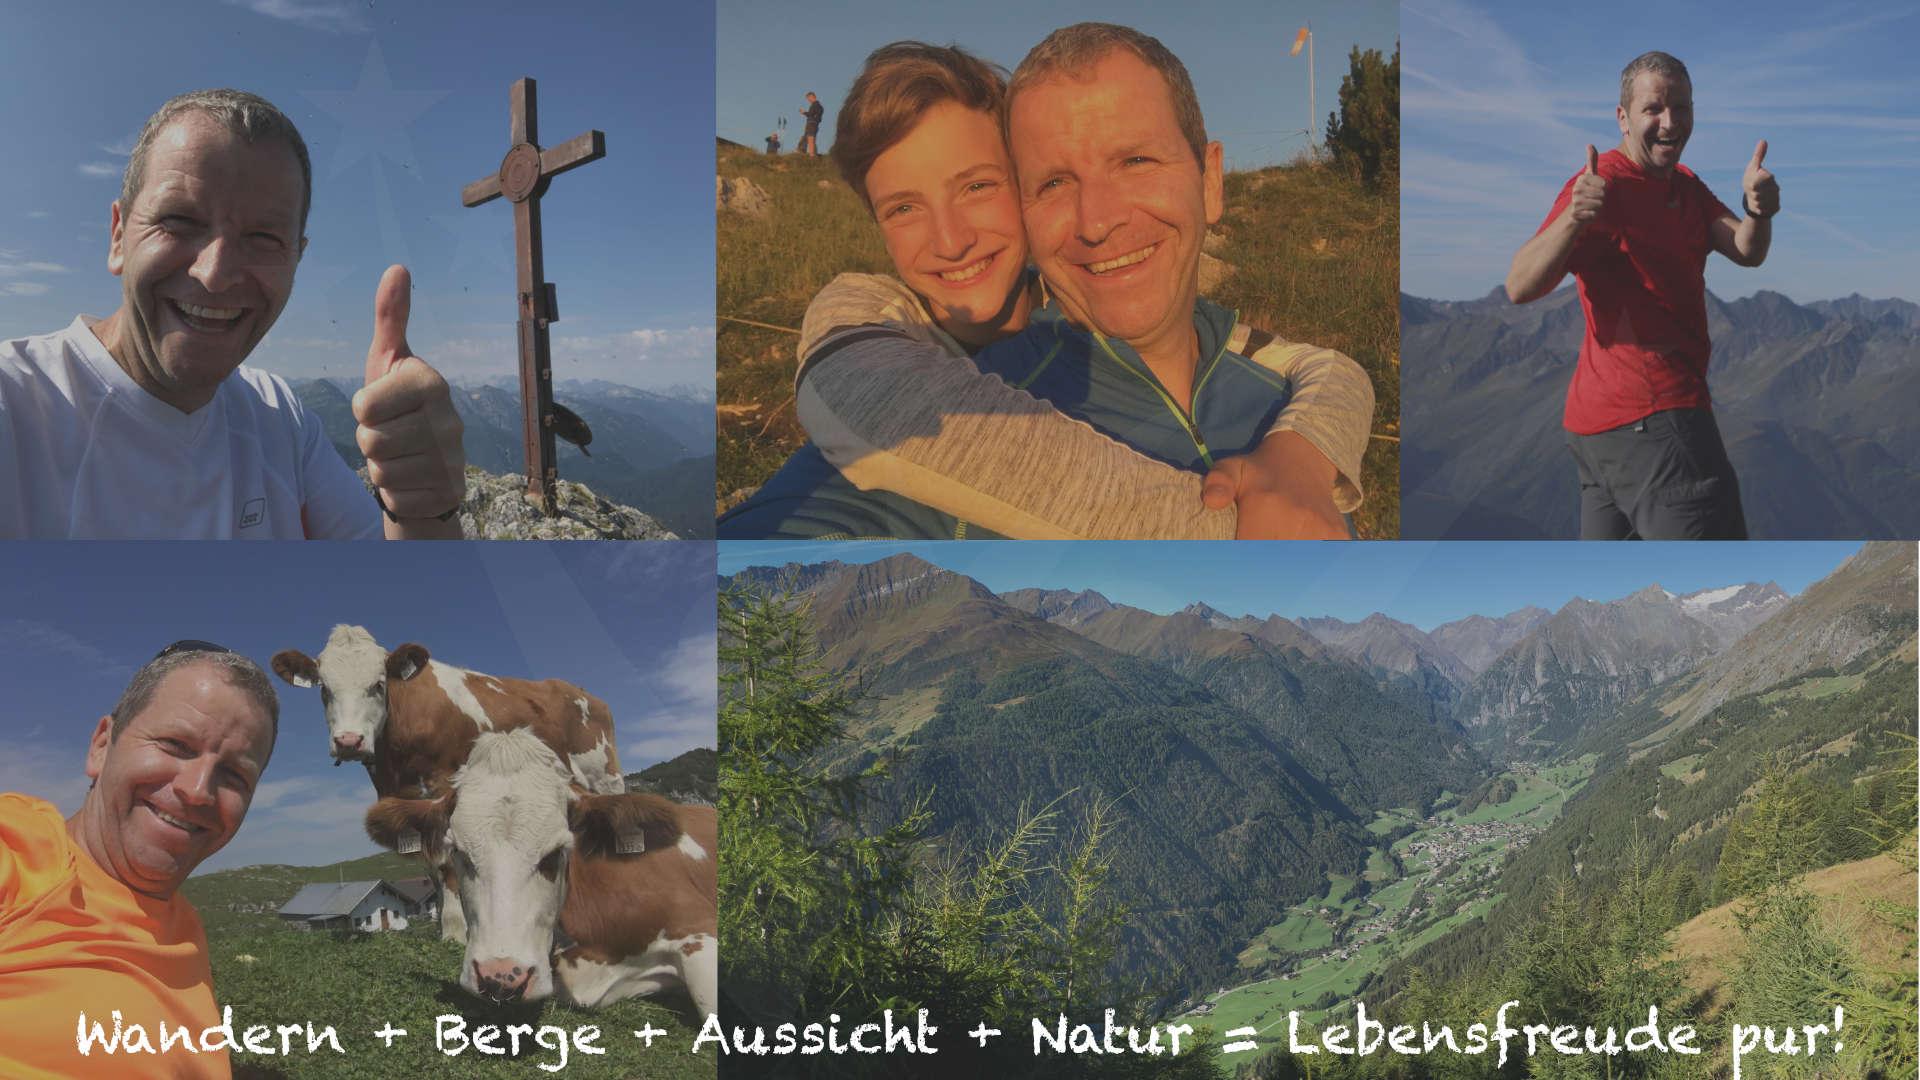 Joachim Auster Wandern Berge